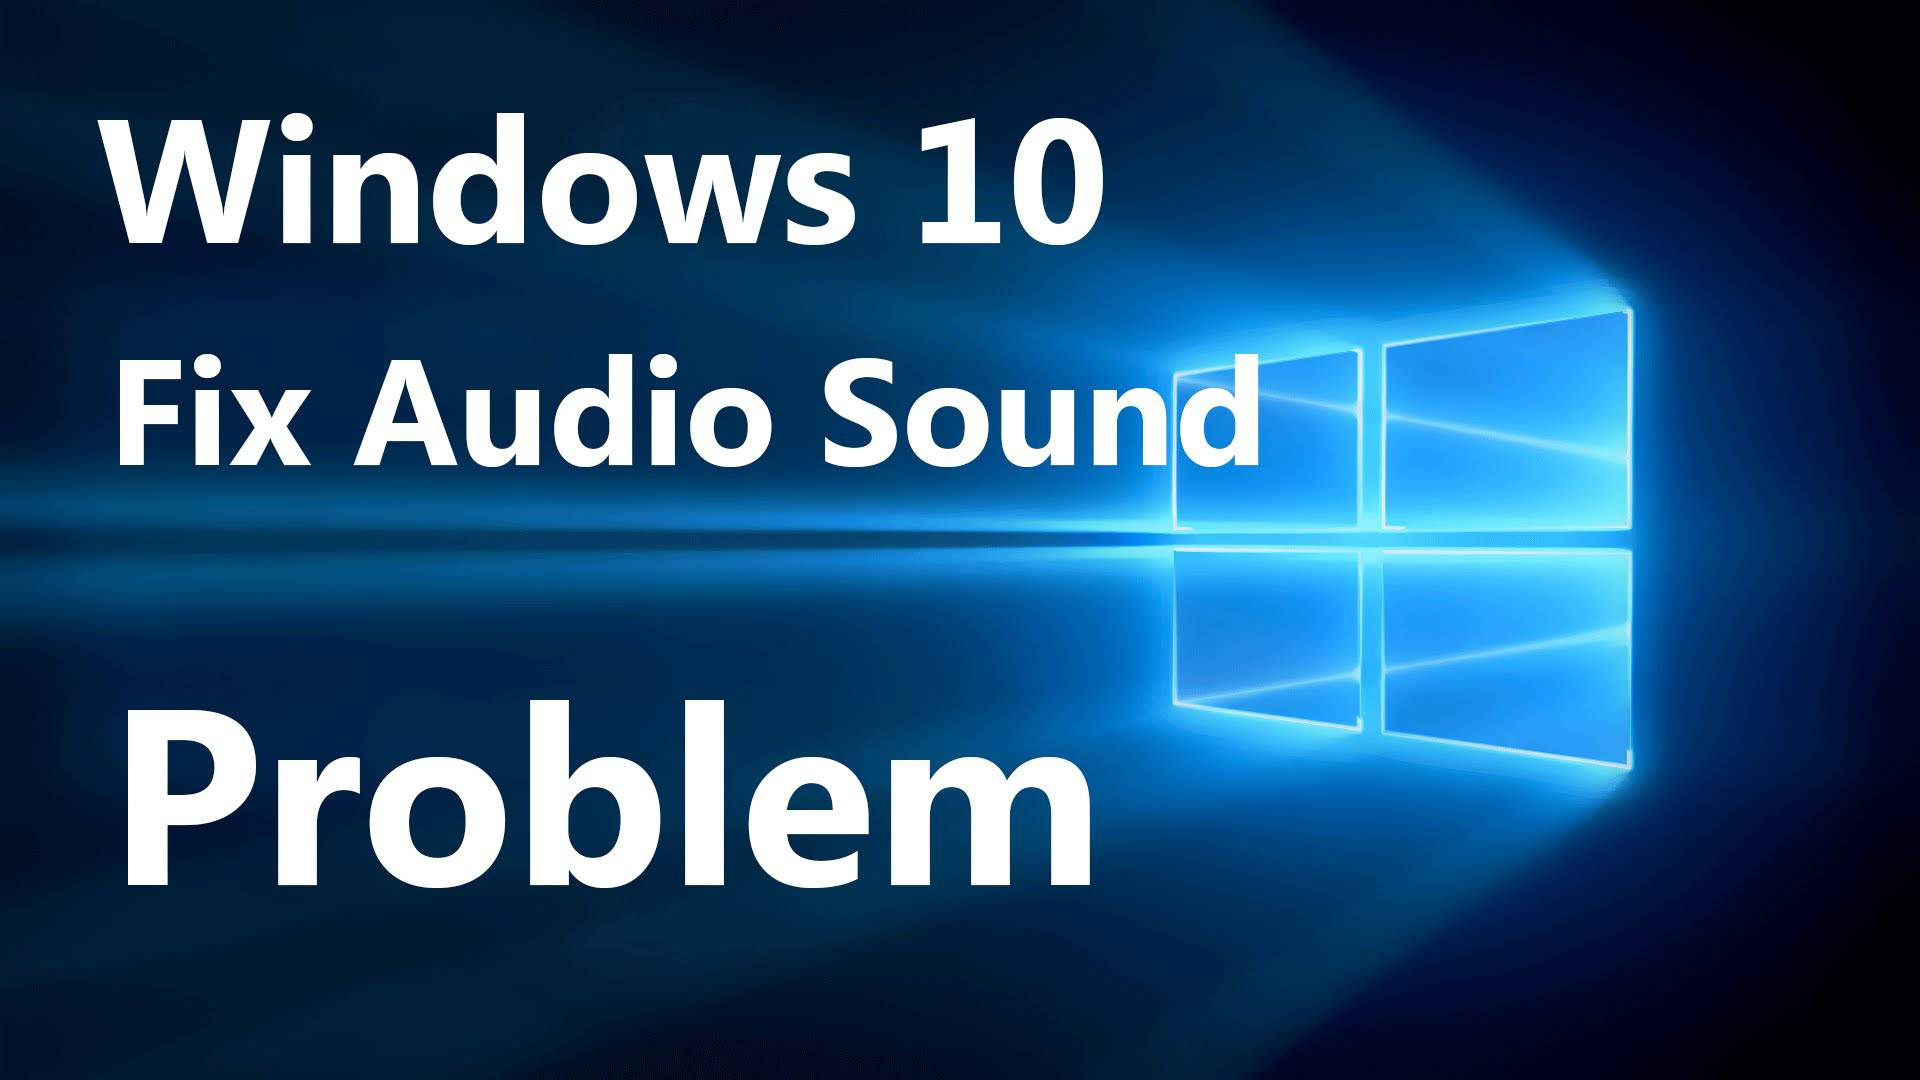 no sound from my computer windows 10